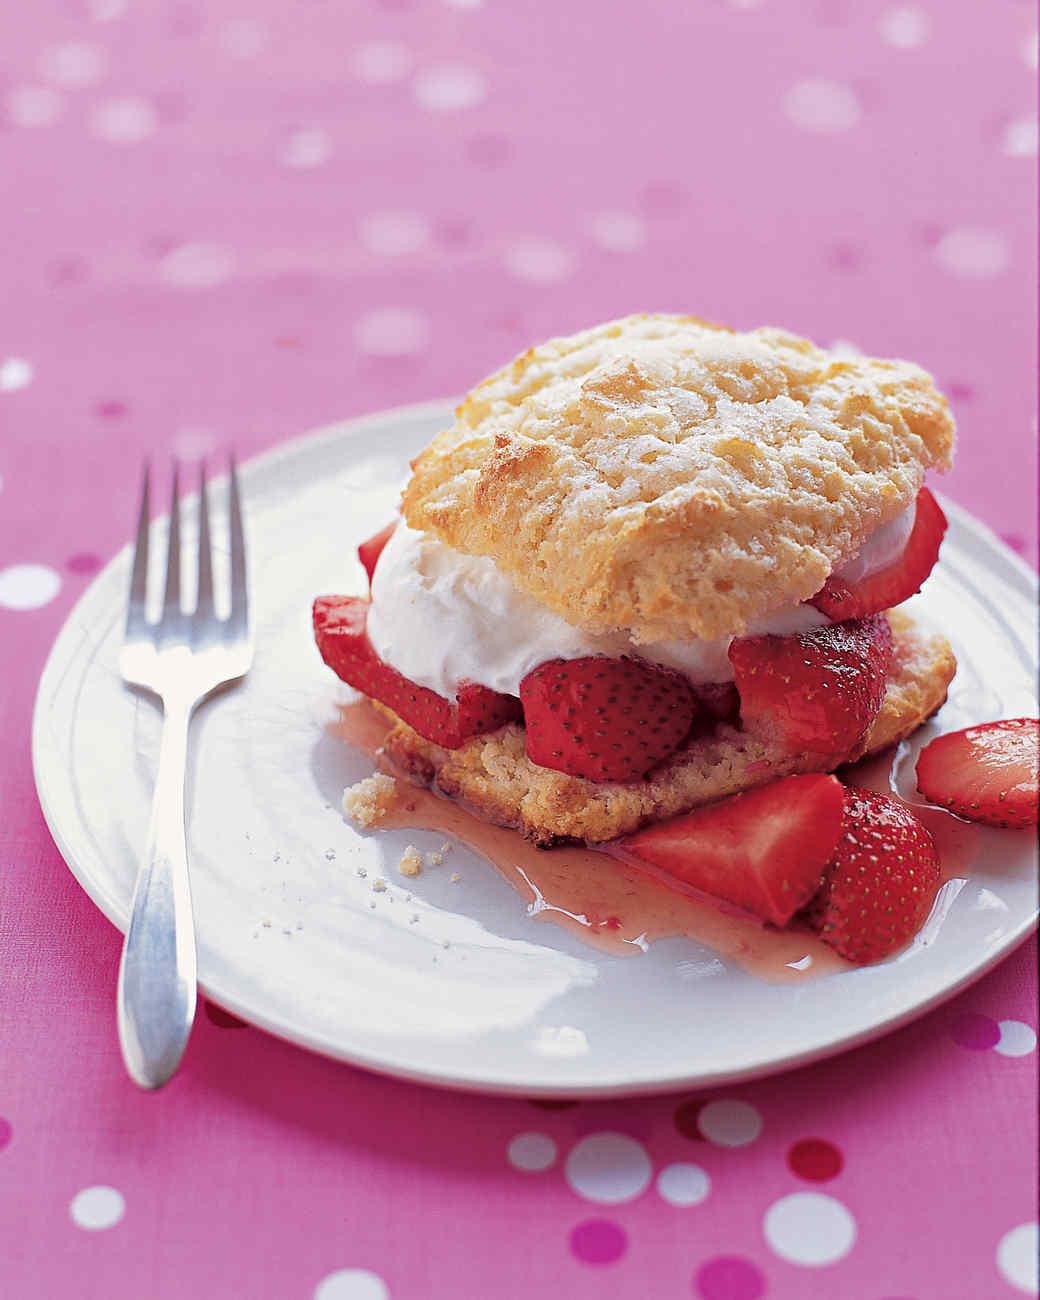 strawberry-shortcake-0505-mea101307.jpg